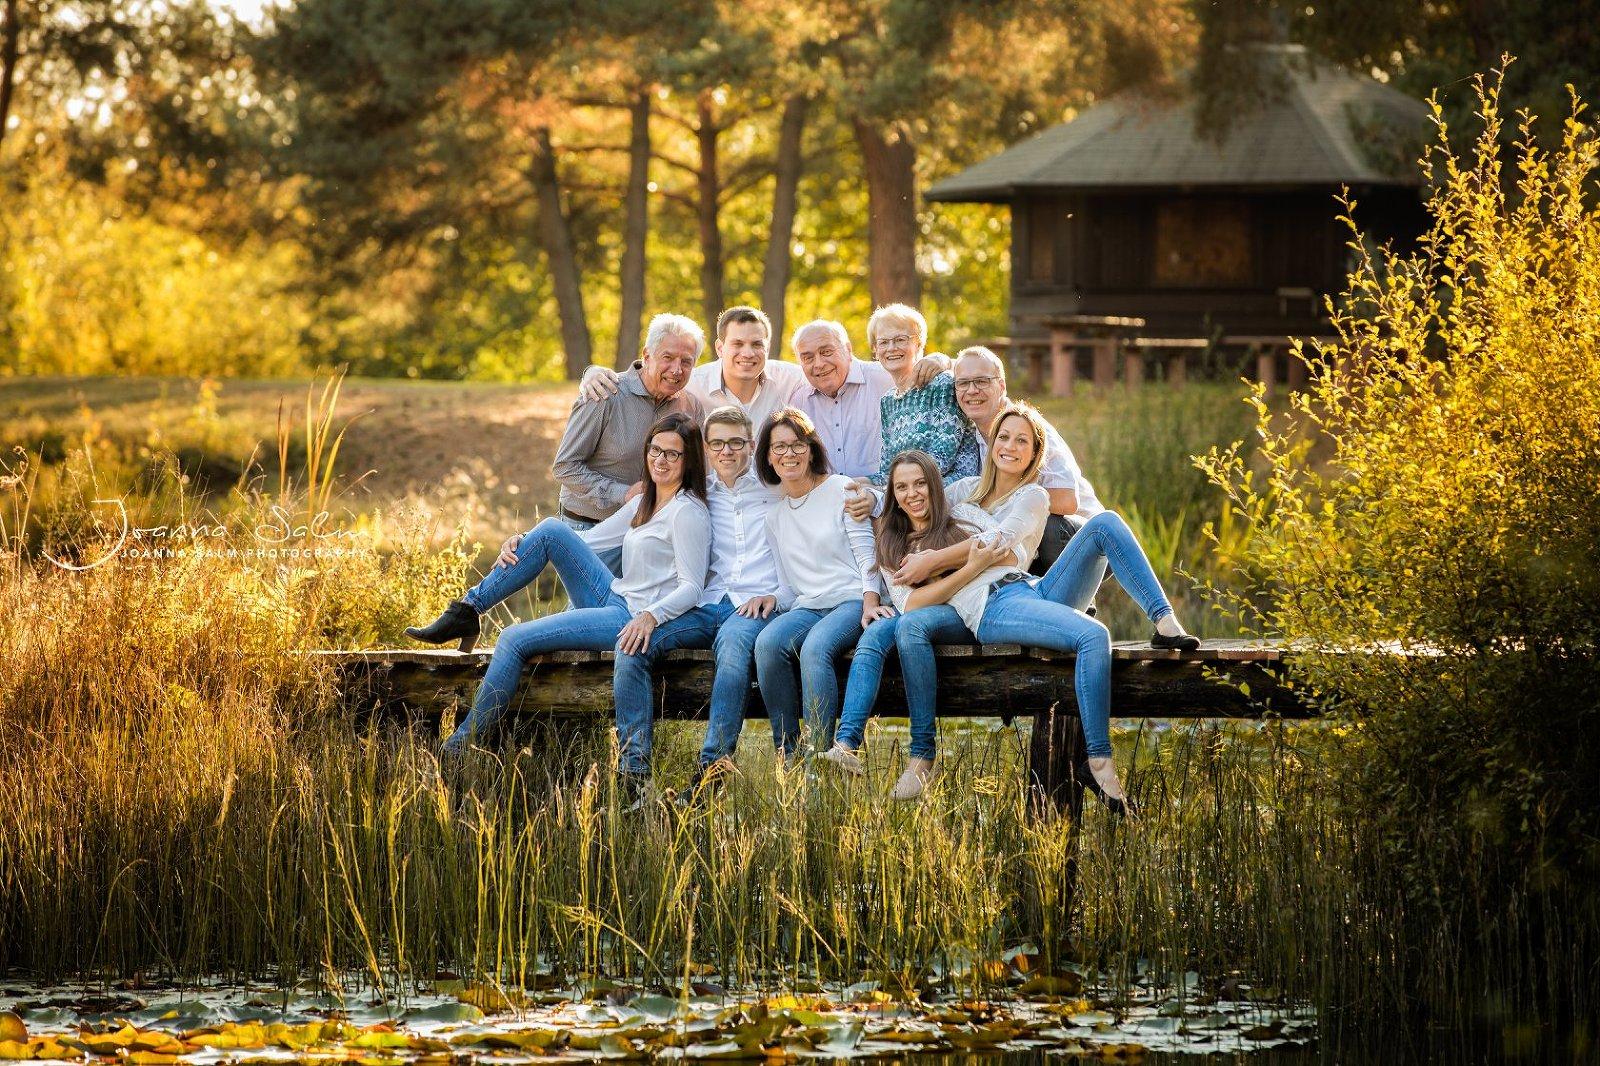 familienbild familienfotograf trier bitburg luxemburg grossfamilie sonnenuntergang steg brücke